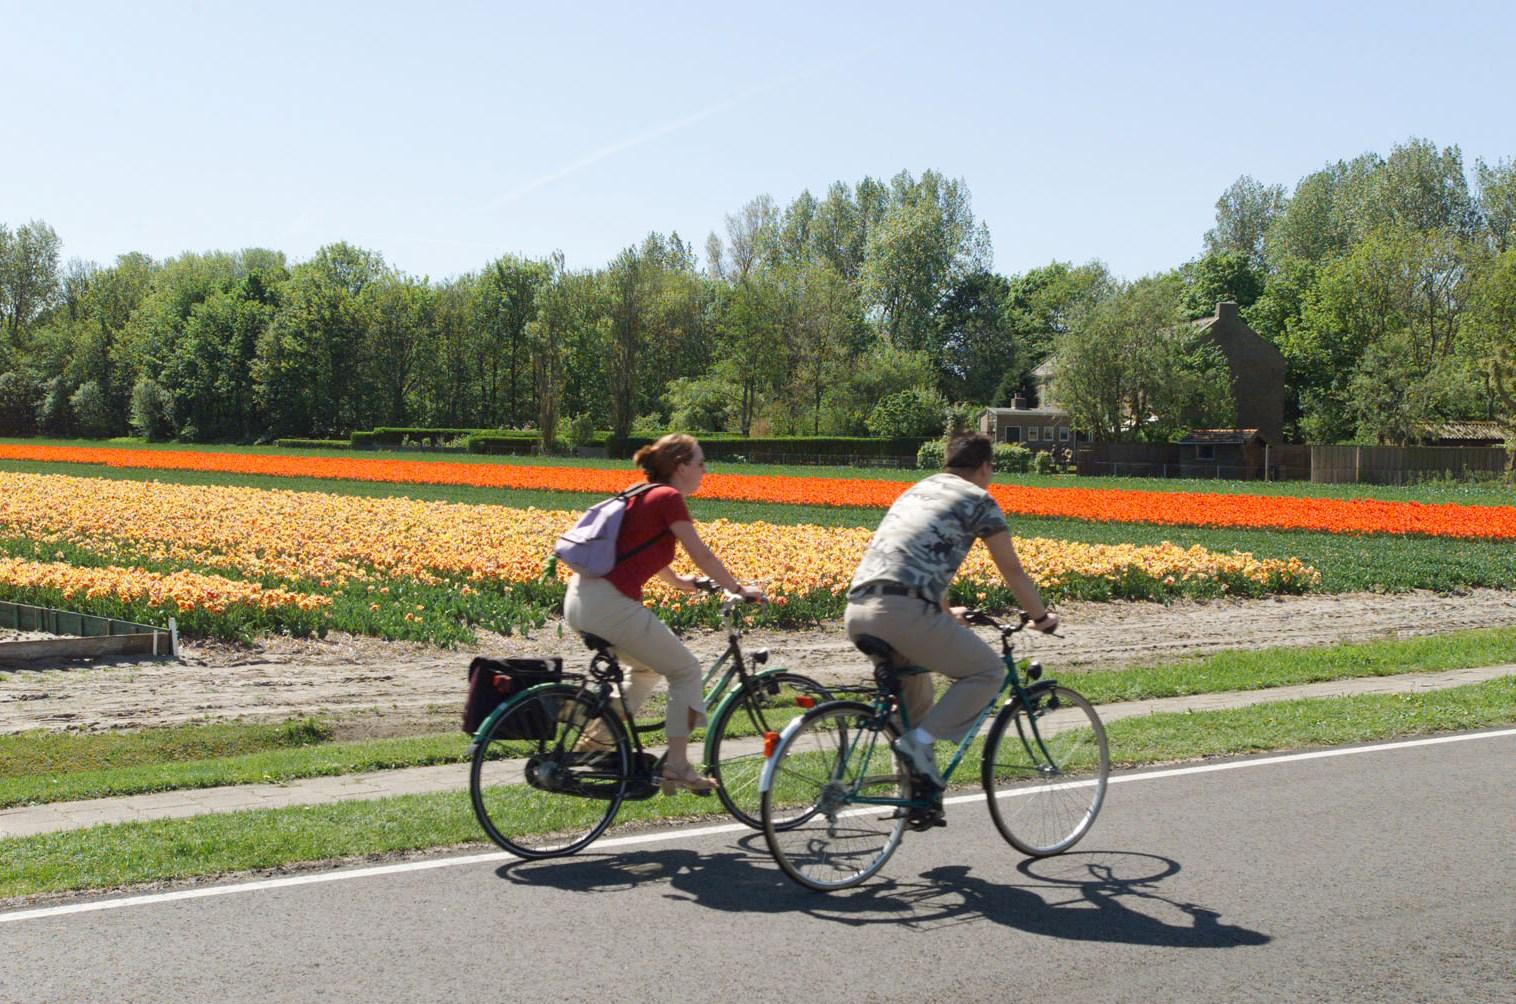 tulip bike tour enjoy springtime with dutch pedelec toursdutch pedelec tours. Black Bedroom Furniture Sets. Home Design Ideas